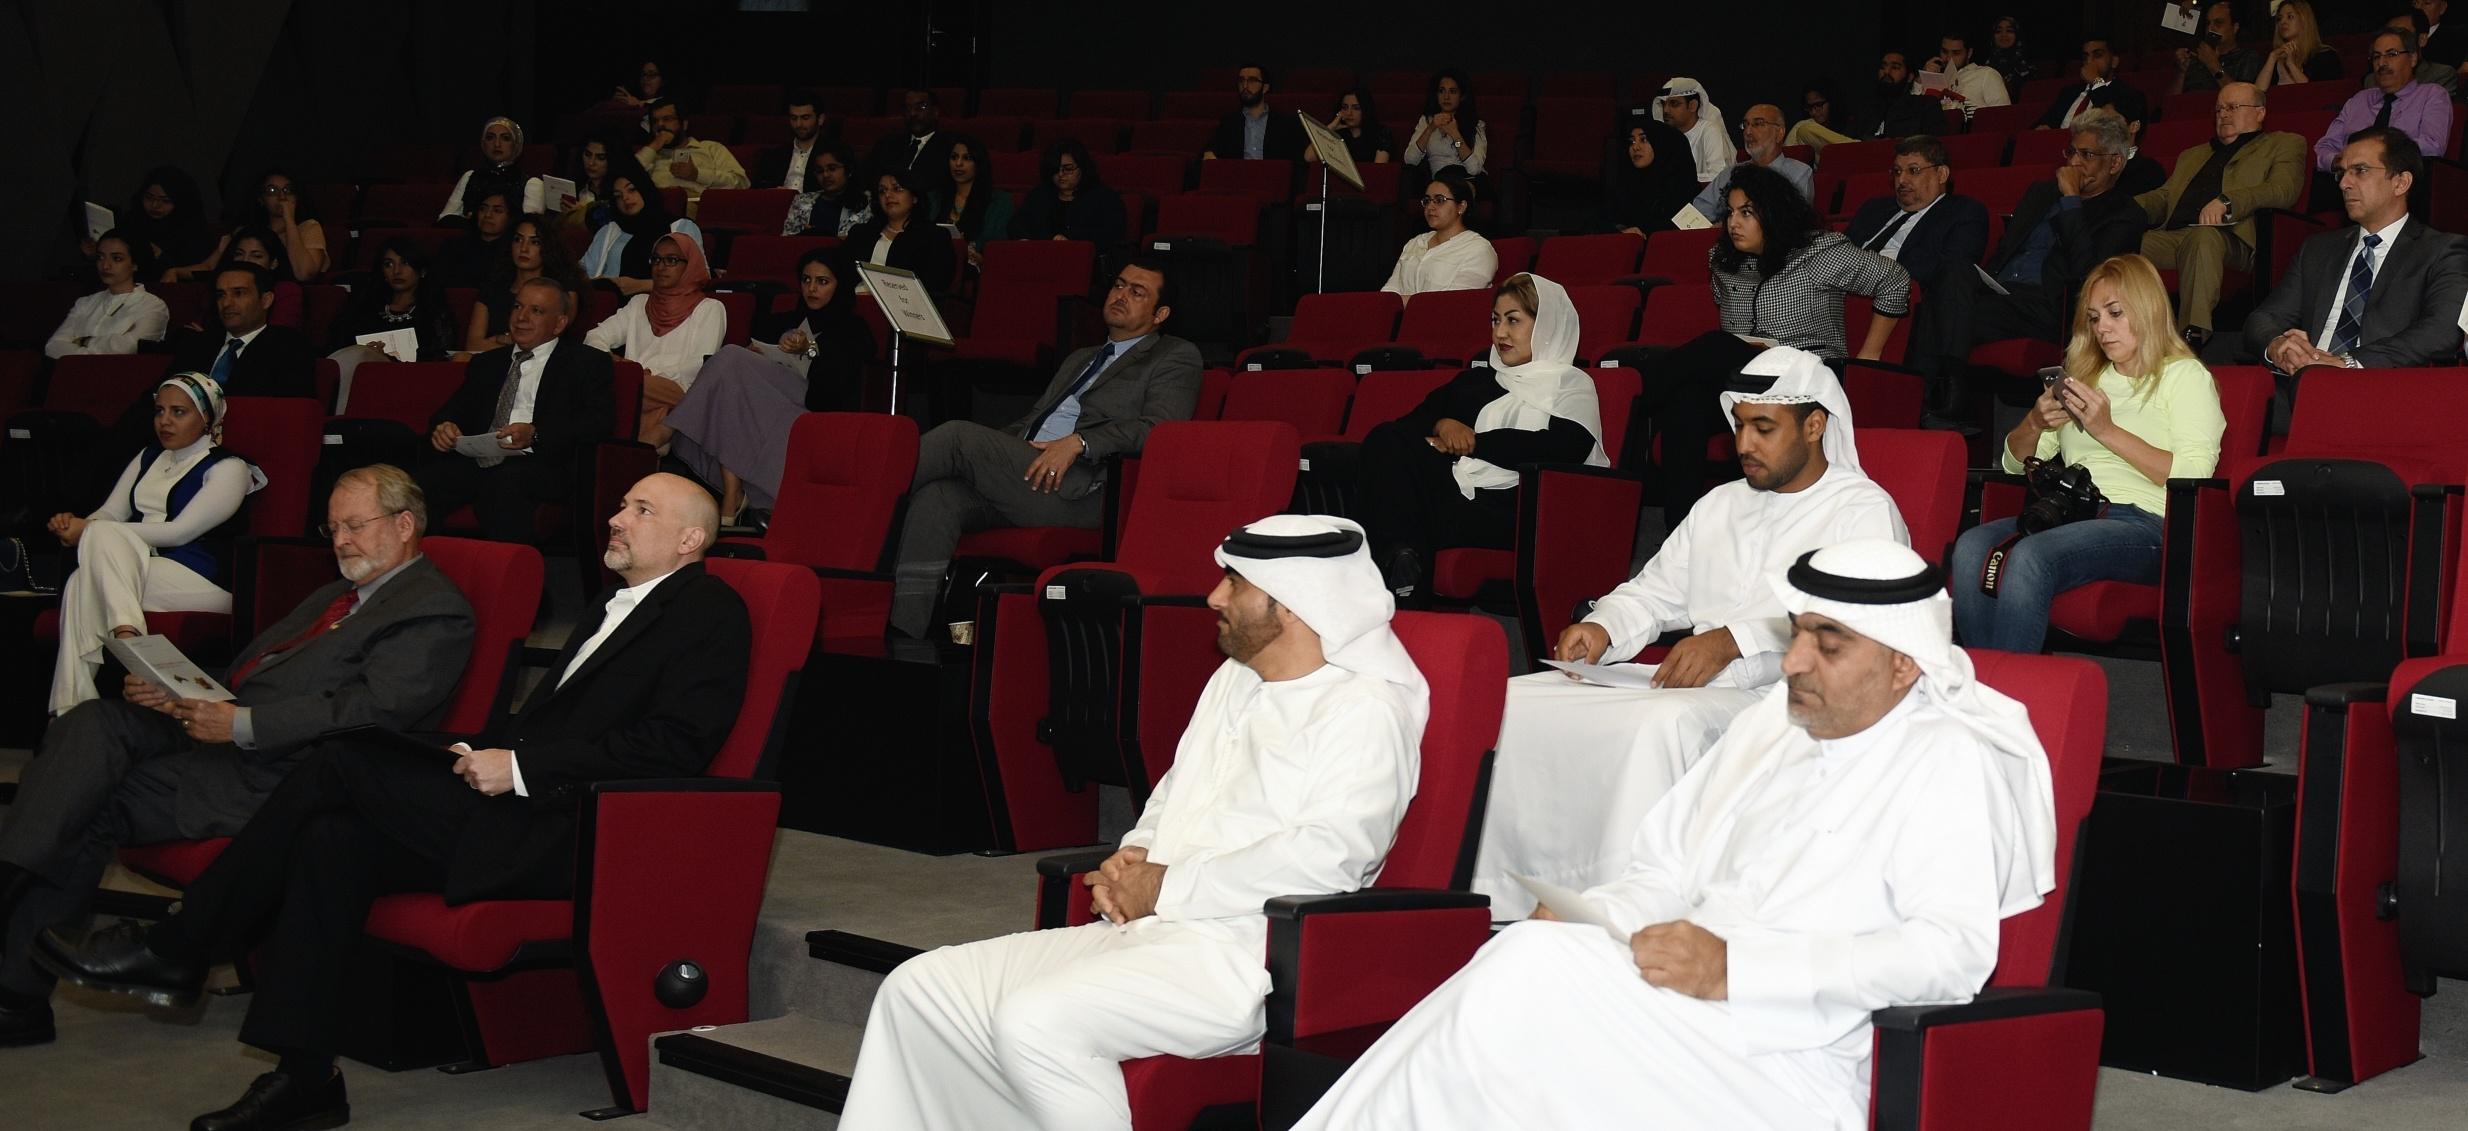 American_University_of_Sharjah_Research_2.jpg